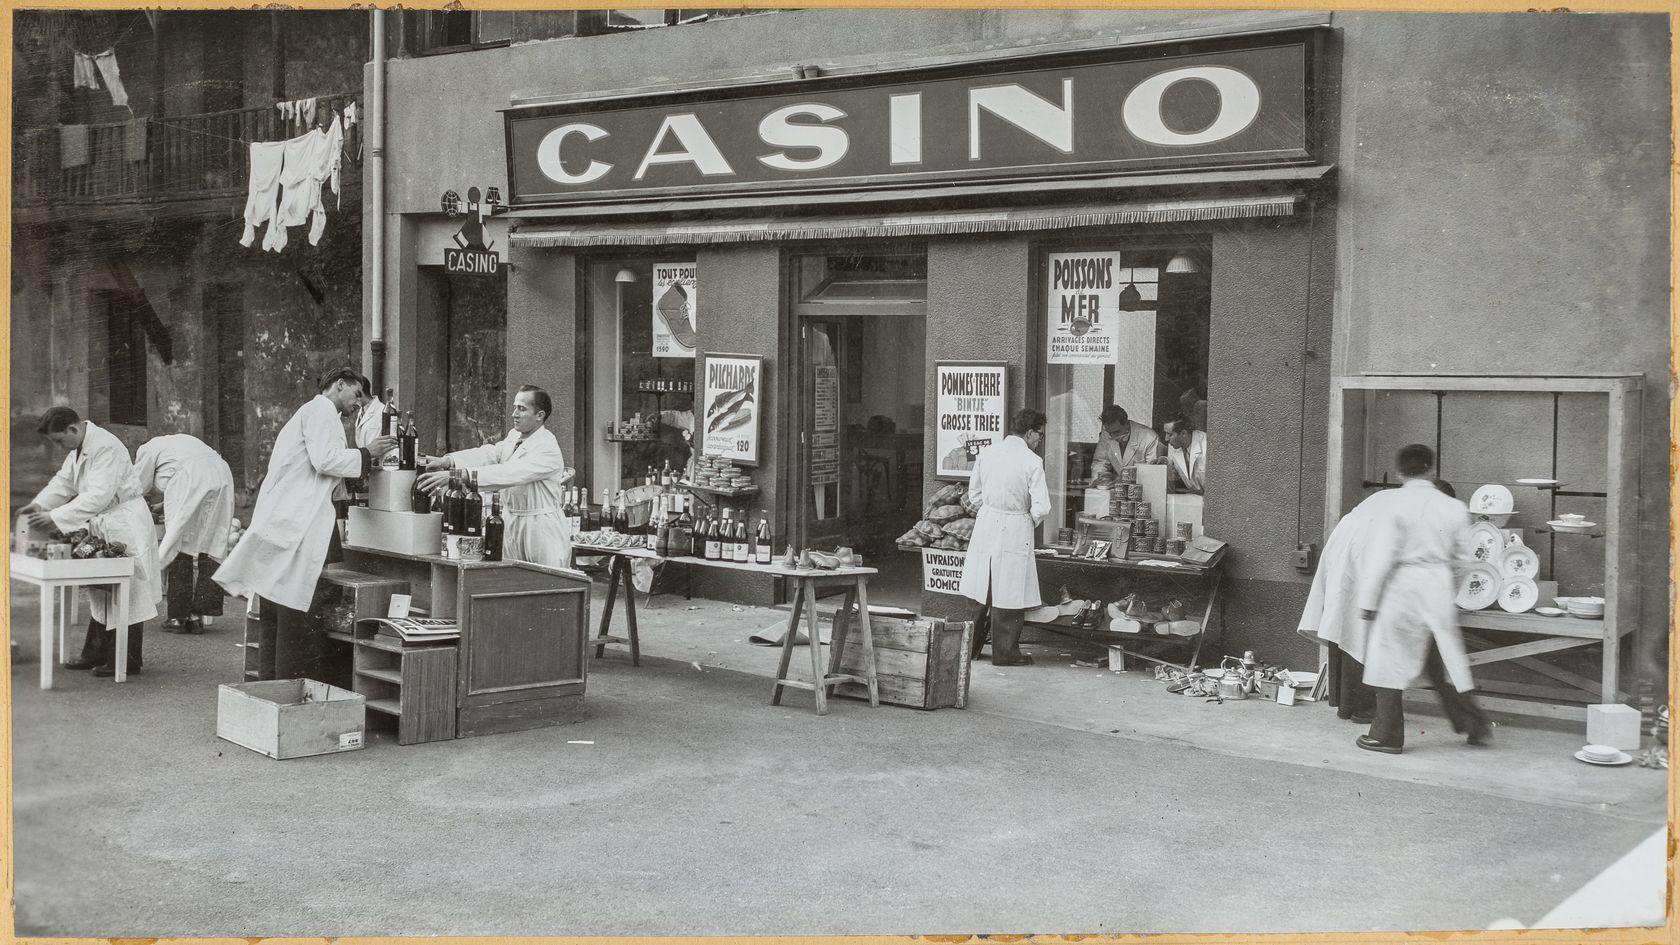 Casino notre patrimoine #4 |